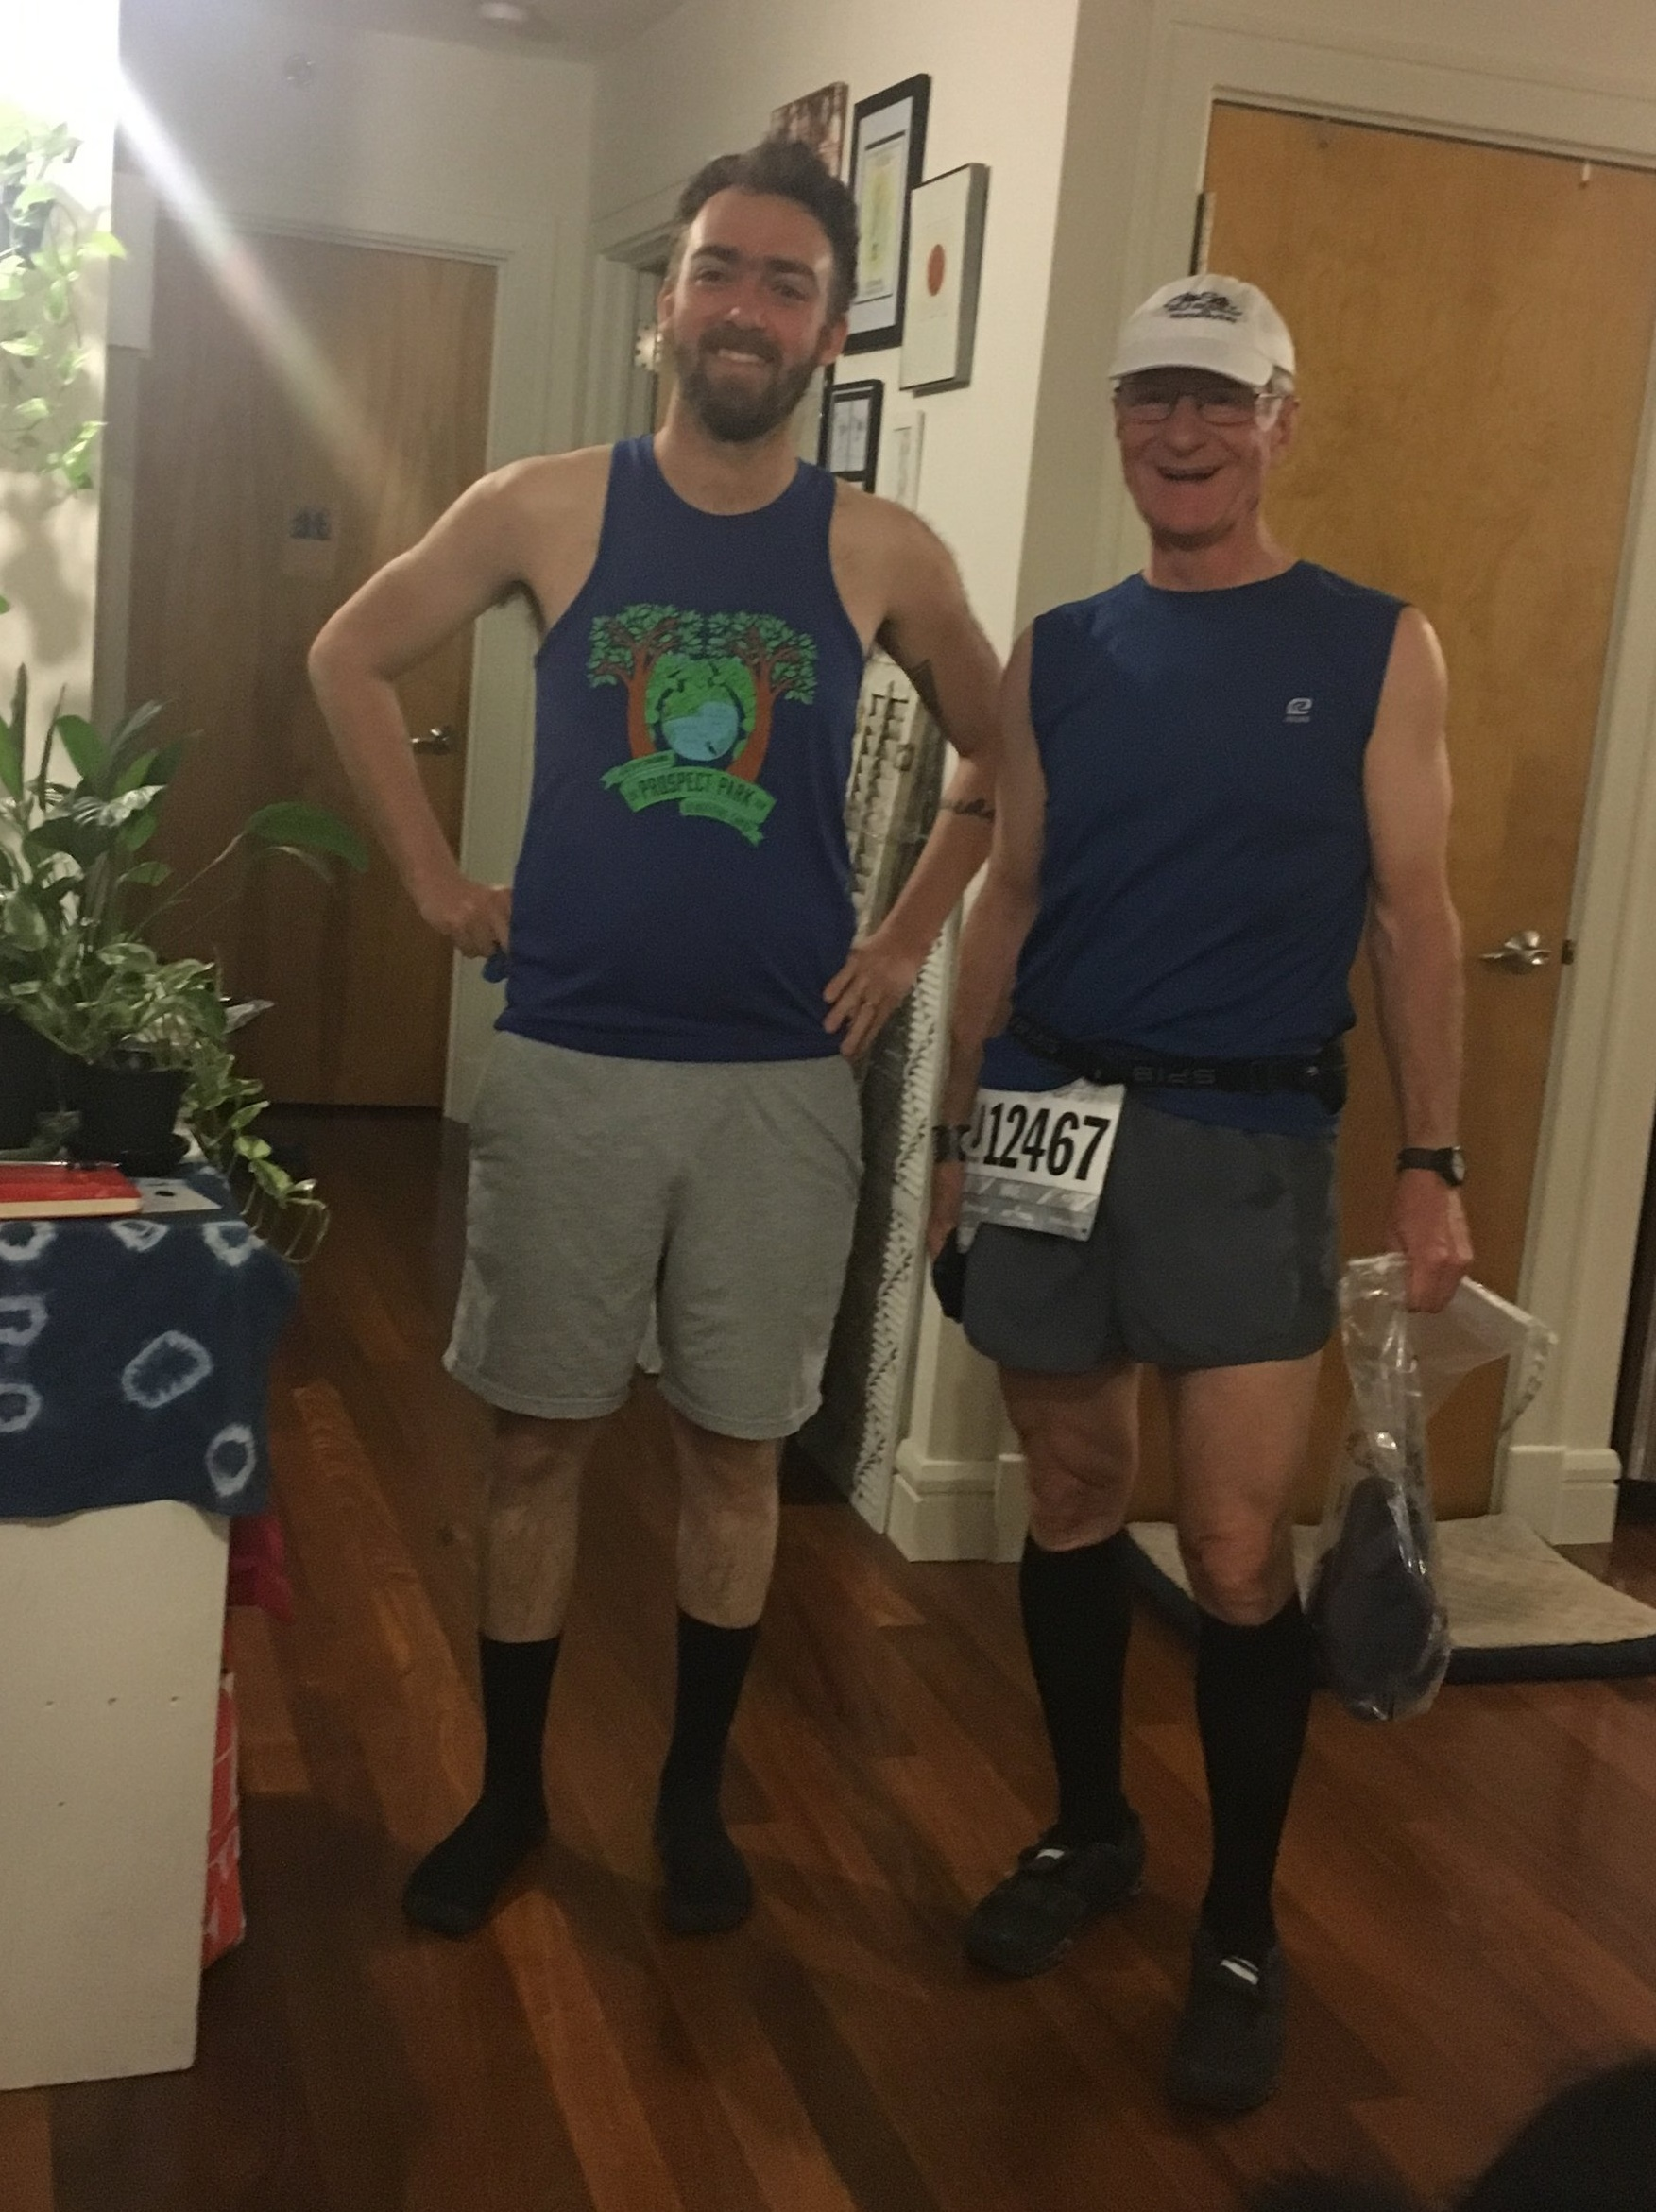 Grandpa Rabble, Pip, and Mark ran the Brooklyn Half Marathon -